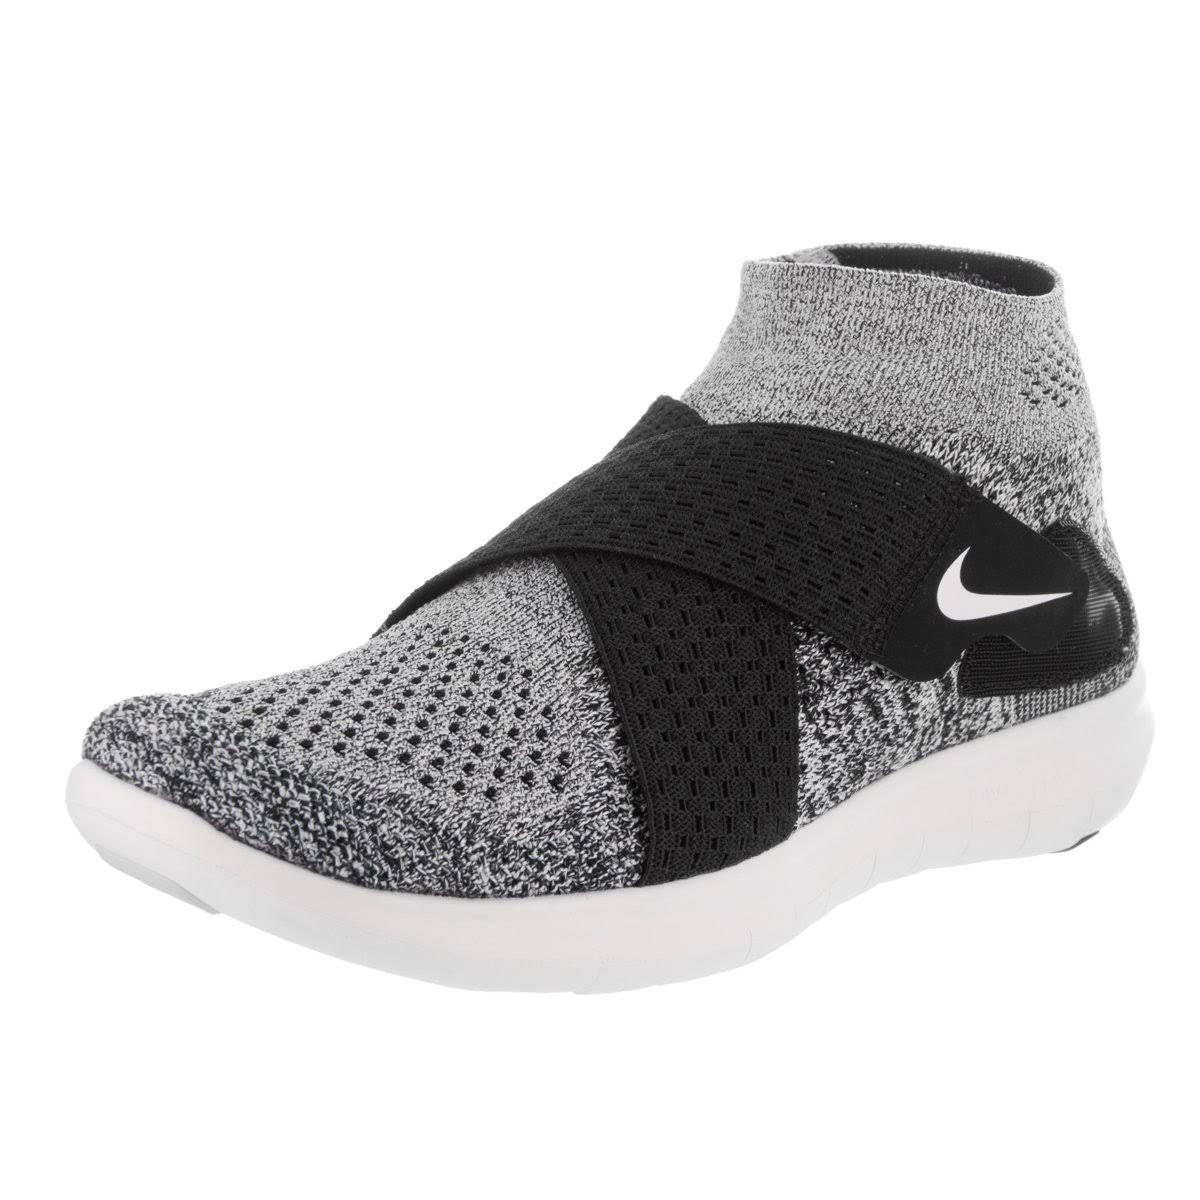 Para Free Flyknit Mujer Nike Zapatillas Running Motion BZ1nXv7wq